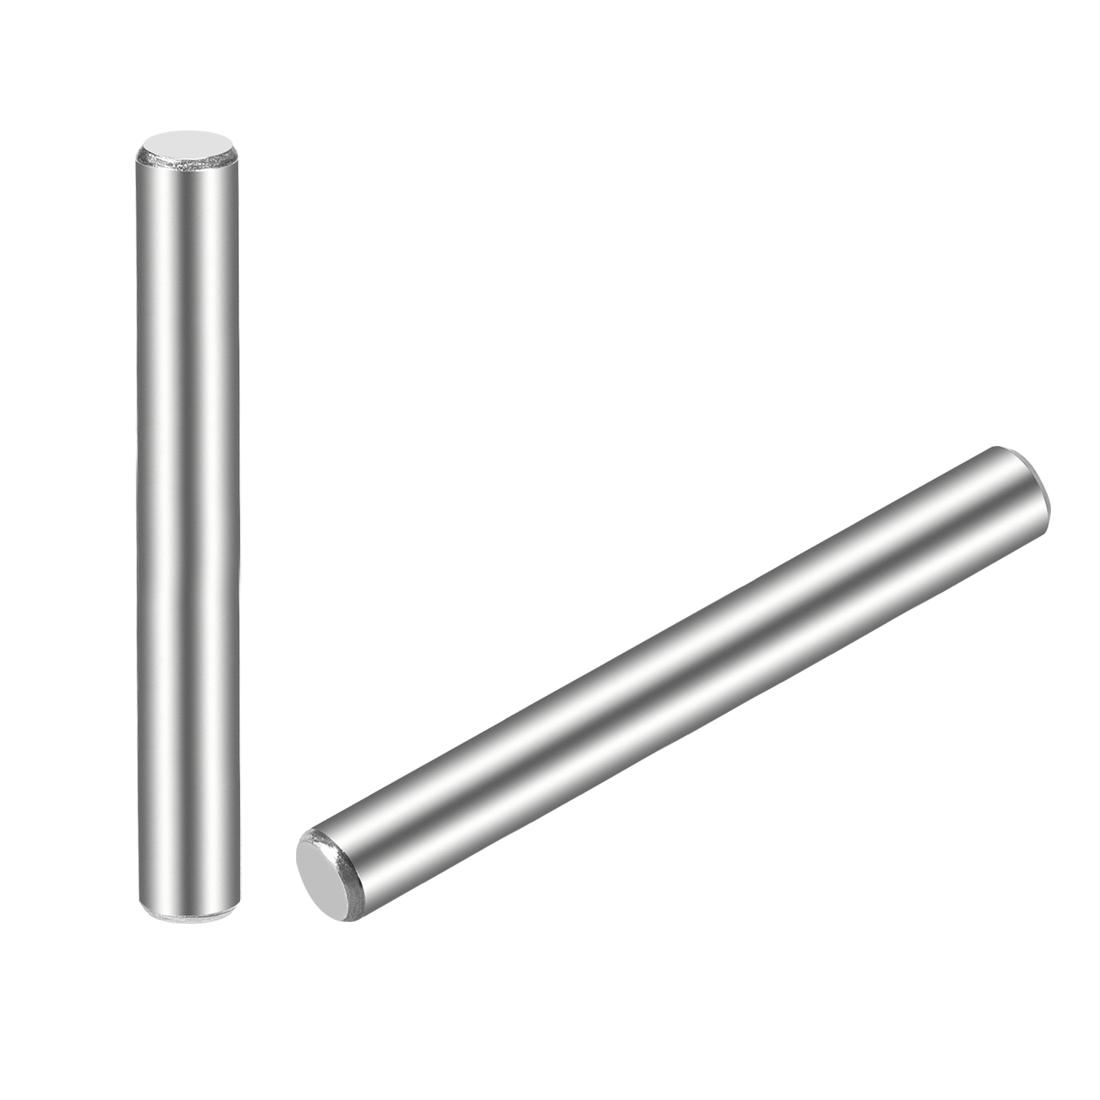 15Pcs 5mm x 70mm Dowel Pin 304 Stainless Steel Shelf Support Pin Fasten